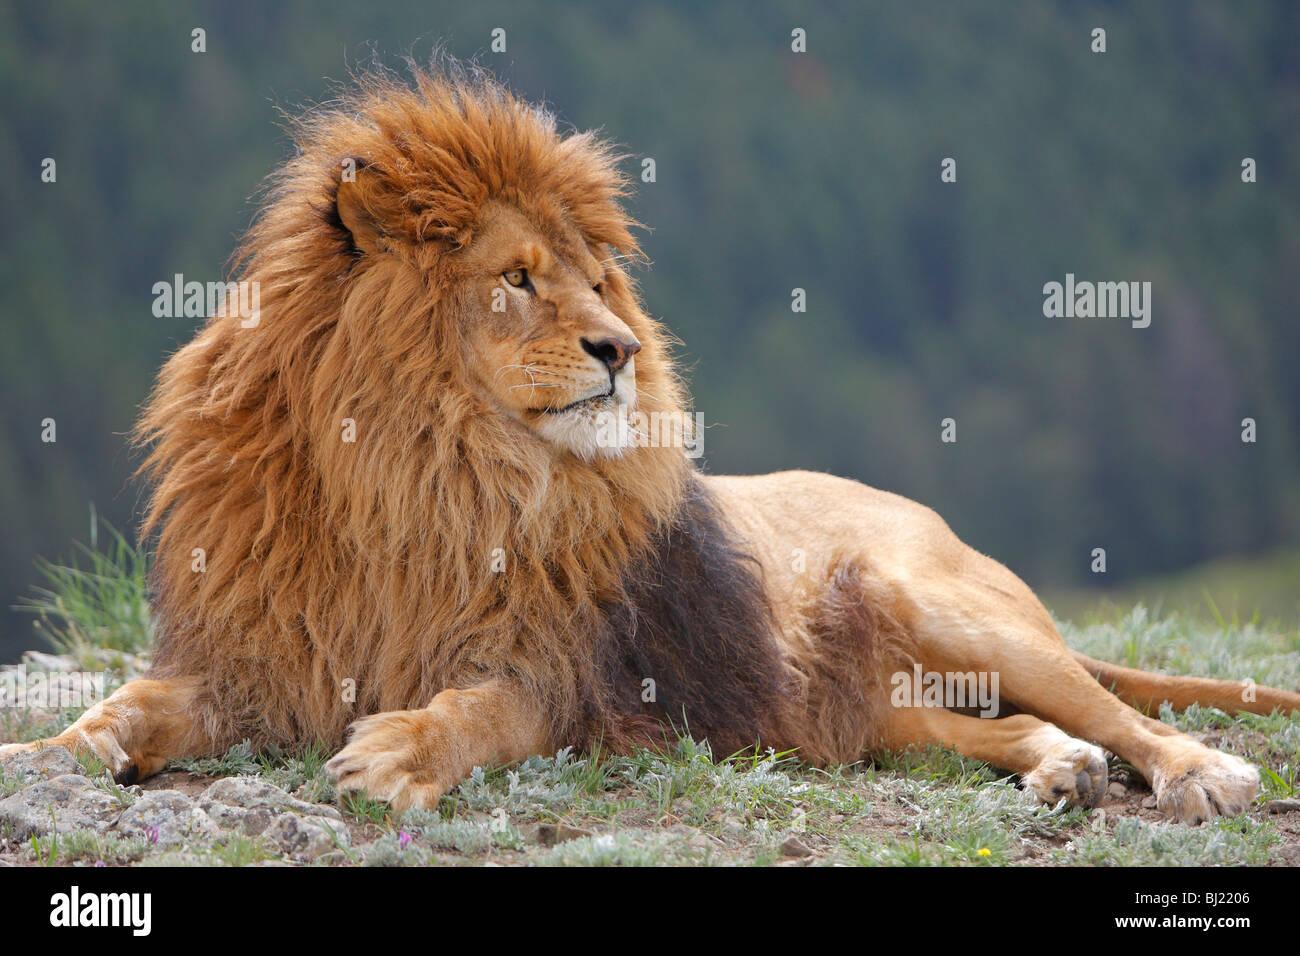 Barbary Lion (Panthera leo leo), lying male. Stock Photo